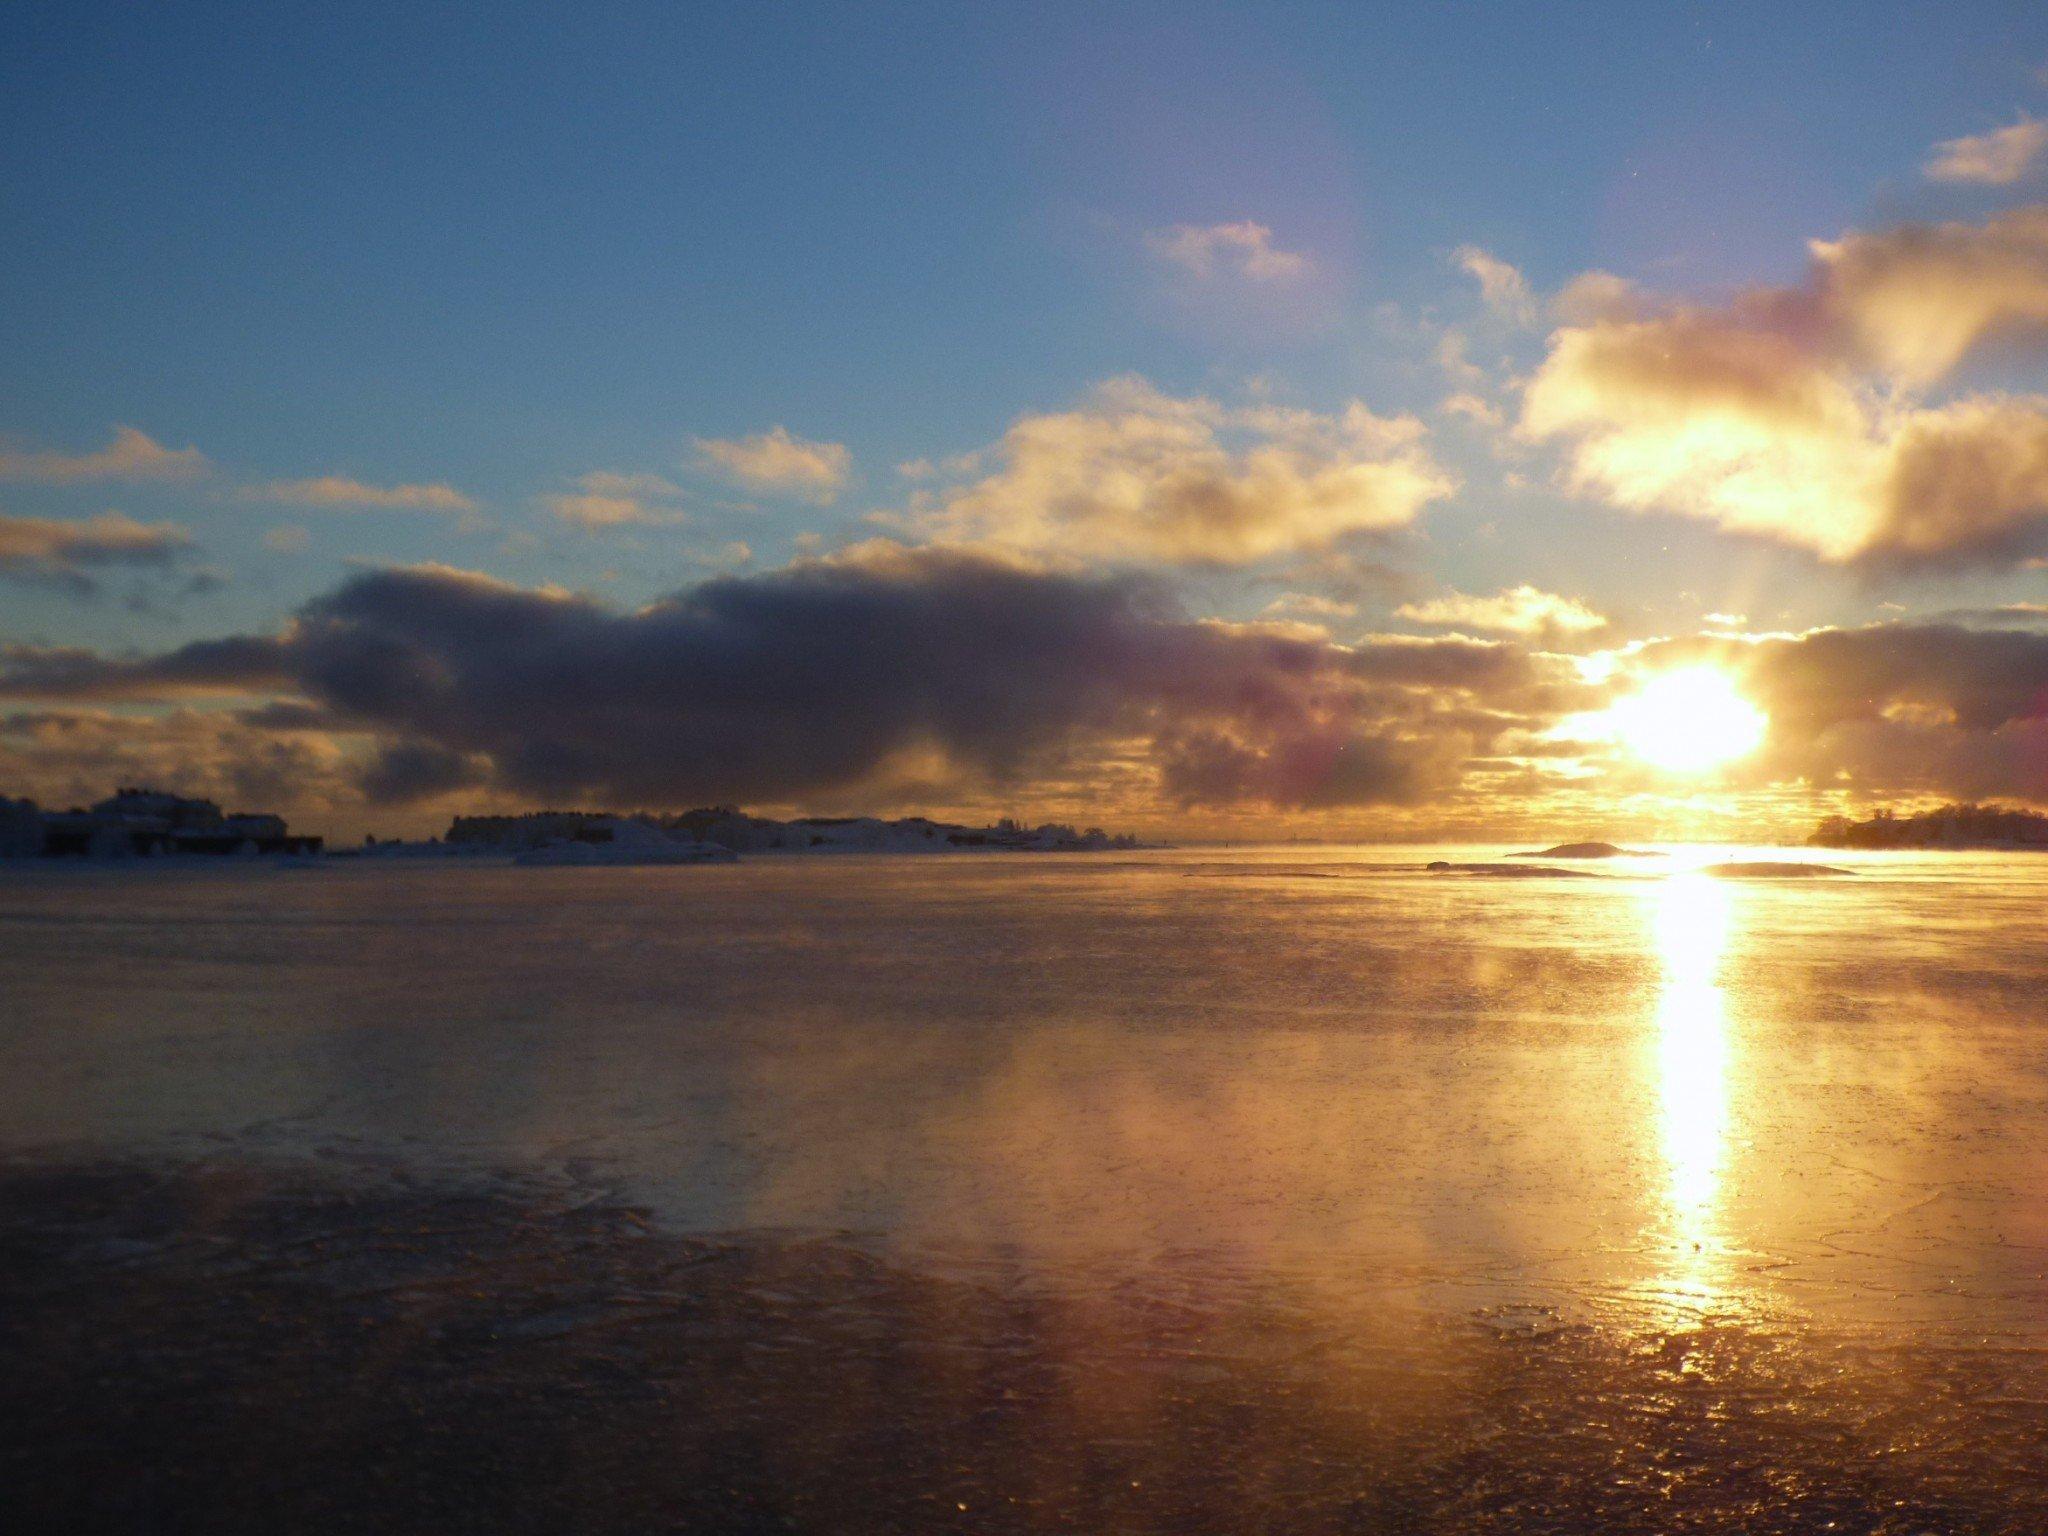 Suomenlinna auringonlasku auringonlasku